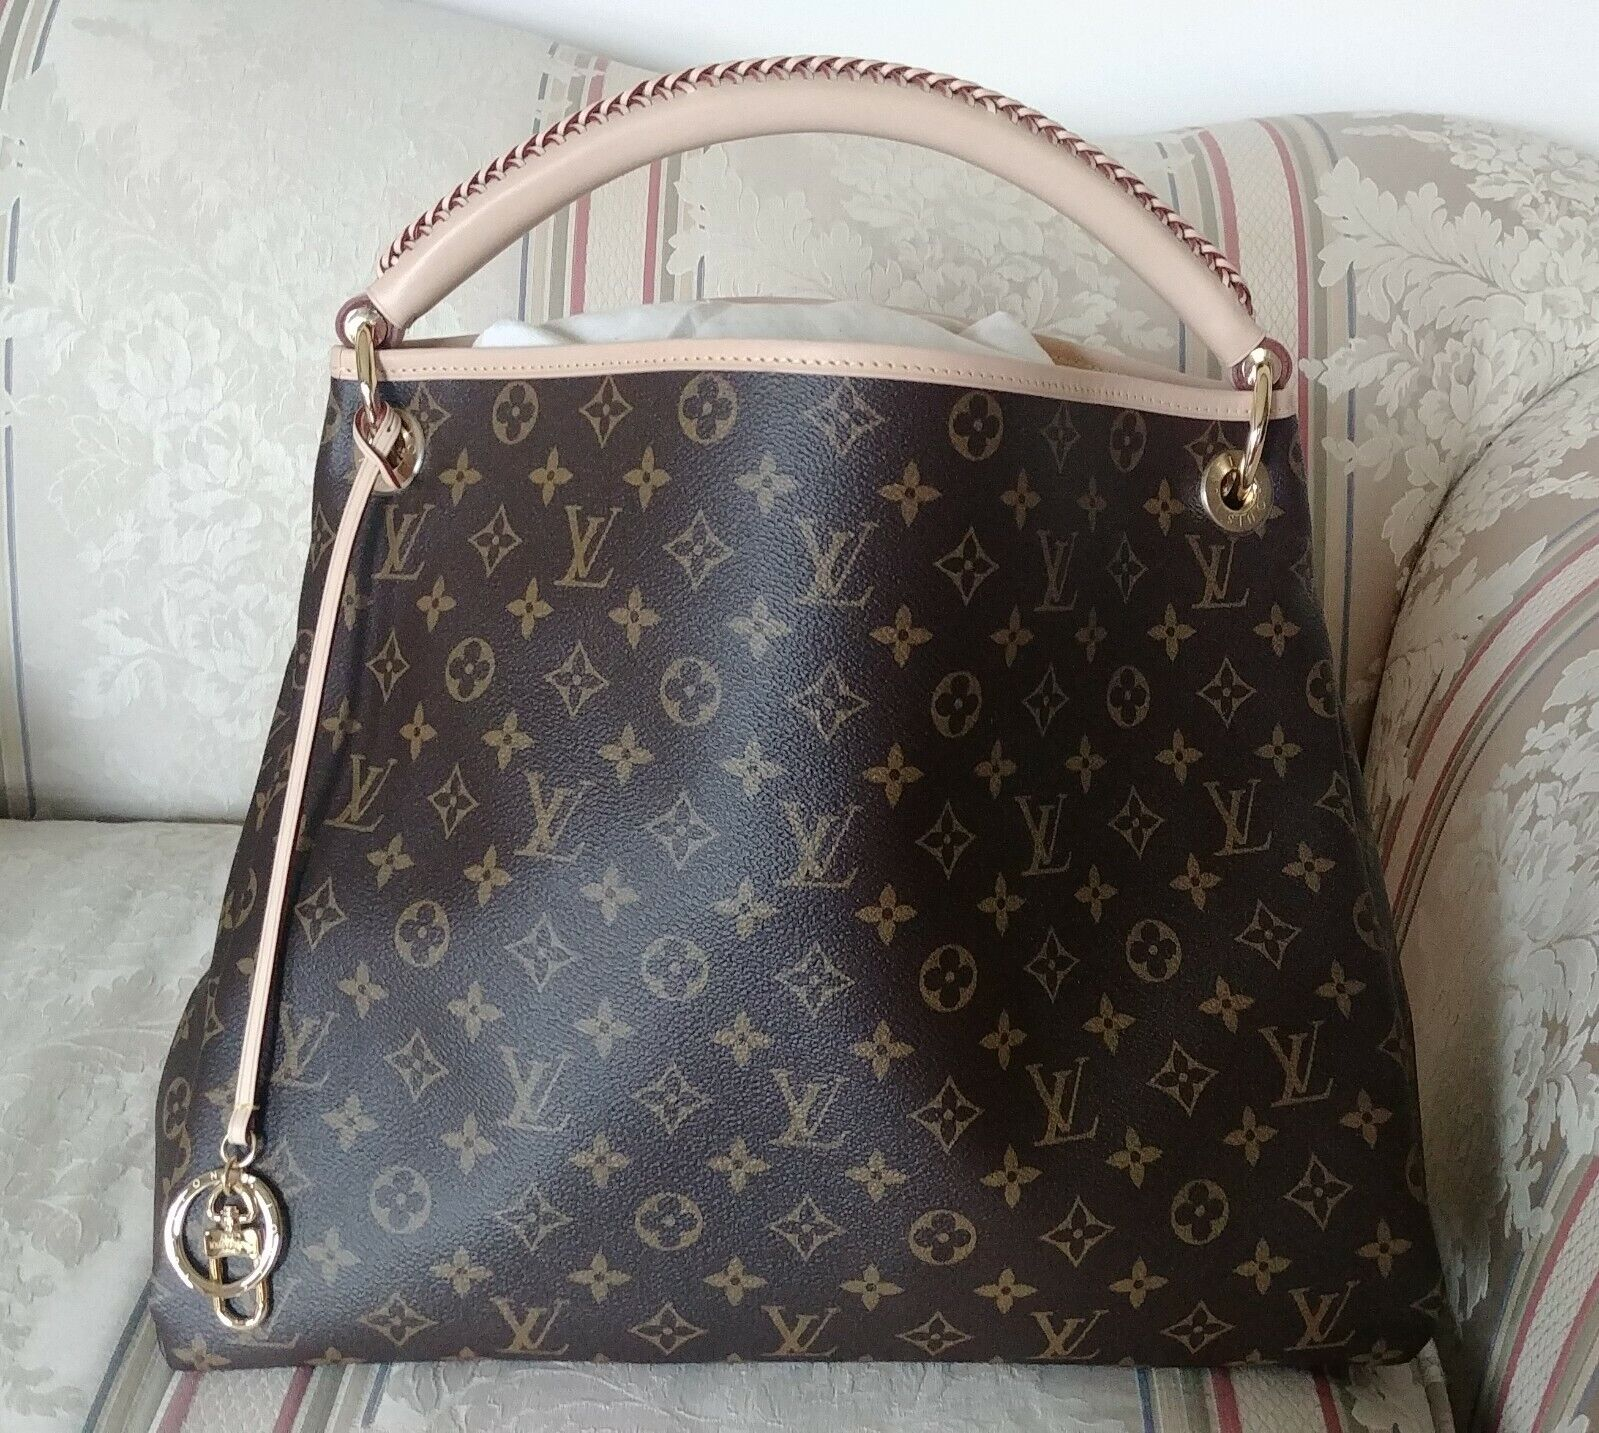 Louis Vuitton Artsy MM BRAND NEW Monogram Handbag Purse AUTHENTIC